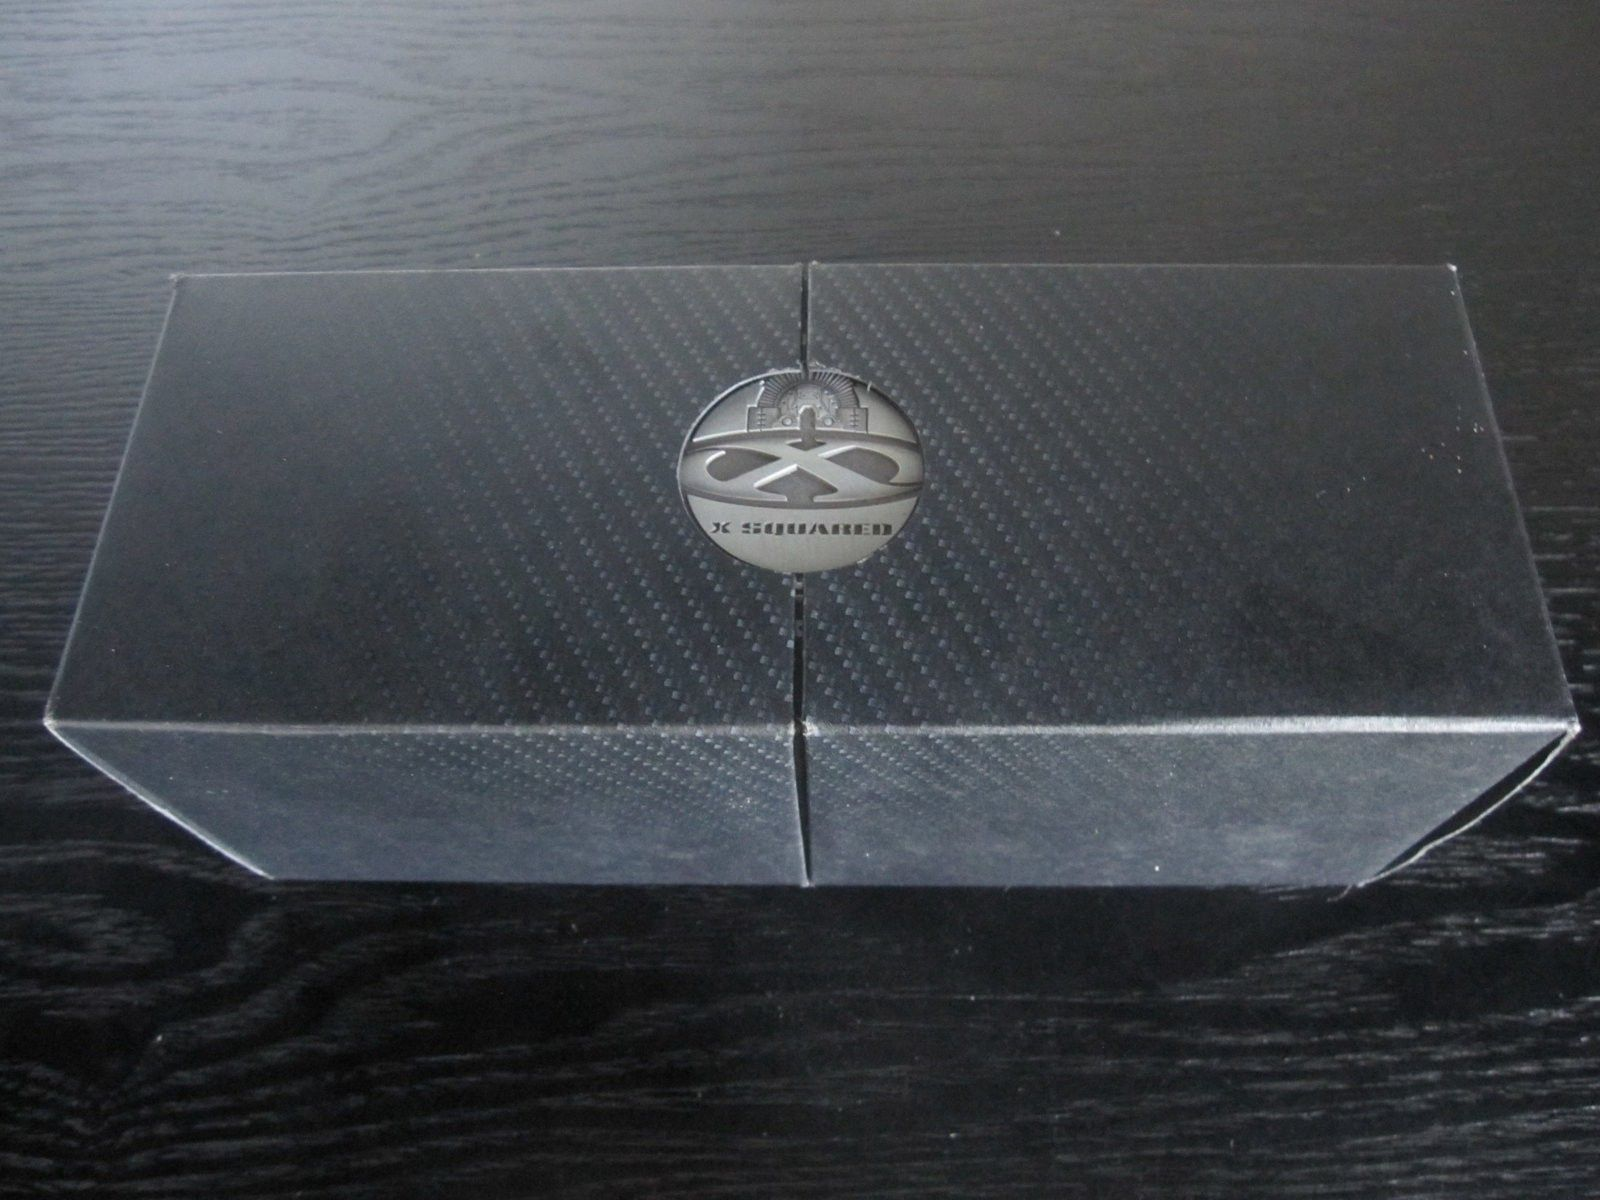 Box & coin for XS OO BIP - sku # 6011-08 - *** $70 *** - IMG_5544.JPG